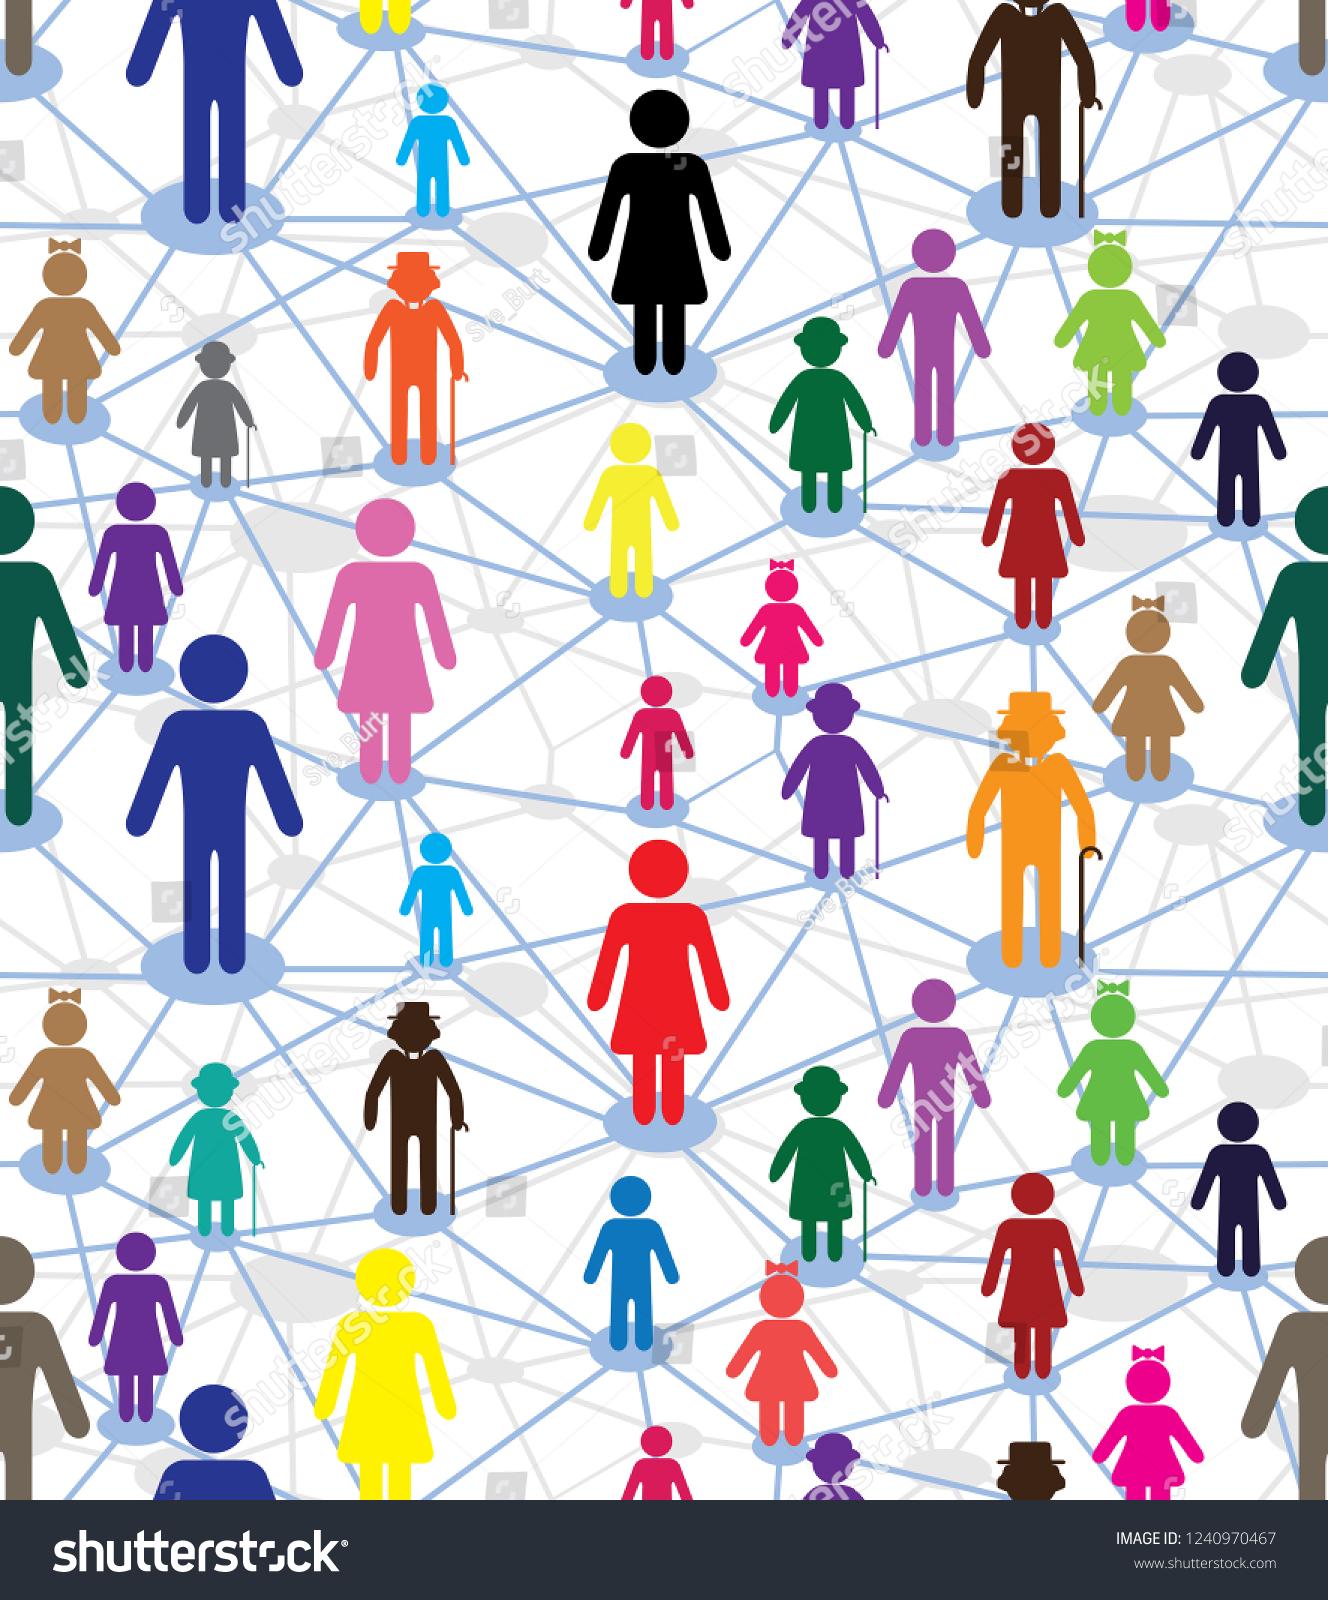 Vector Generation Diagram People Web Relationship Stock Vector Royalty Free 1240970467